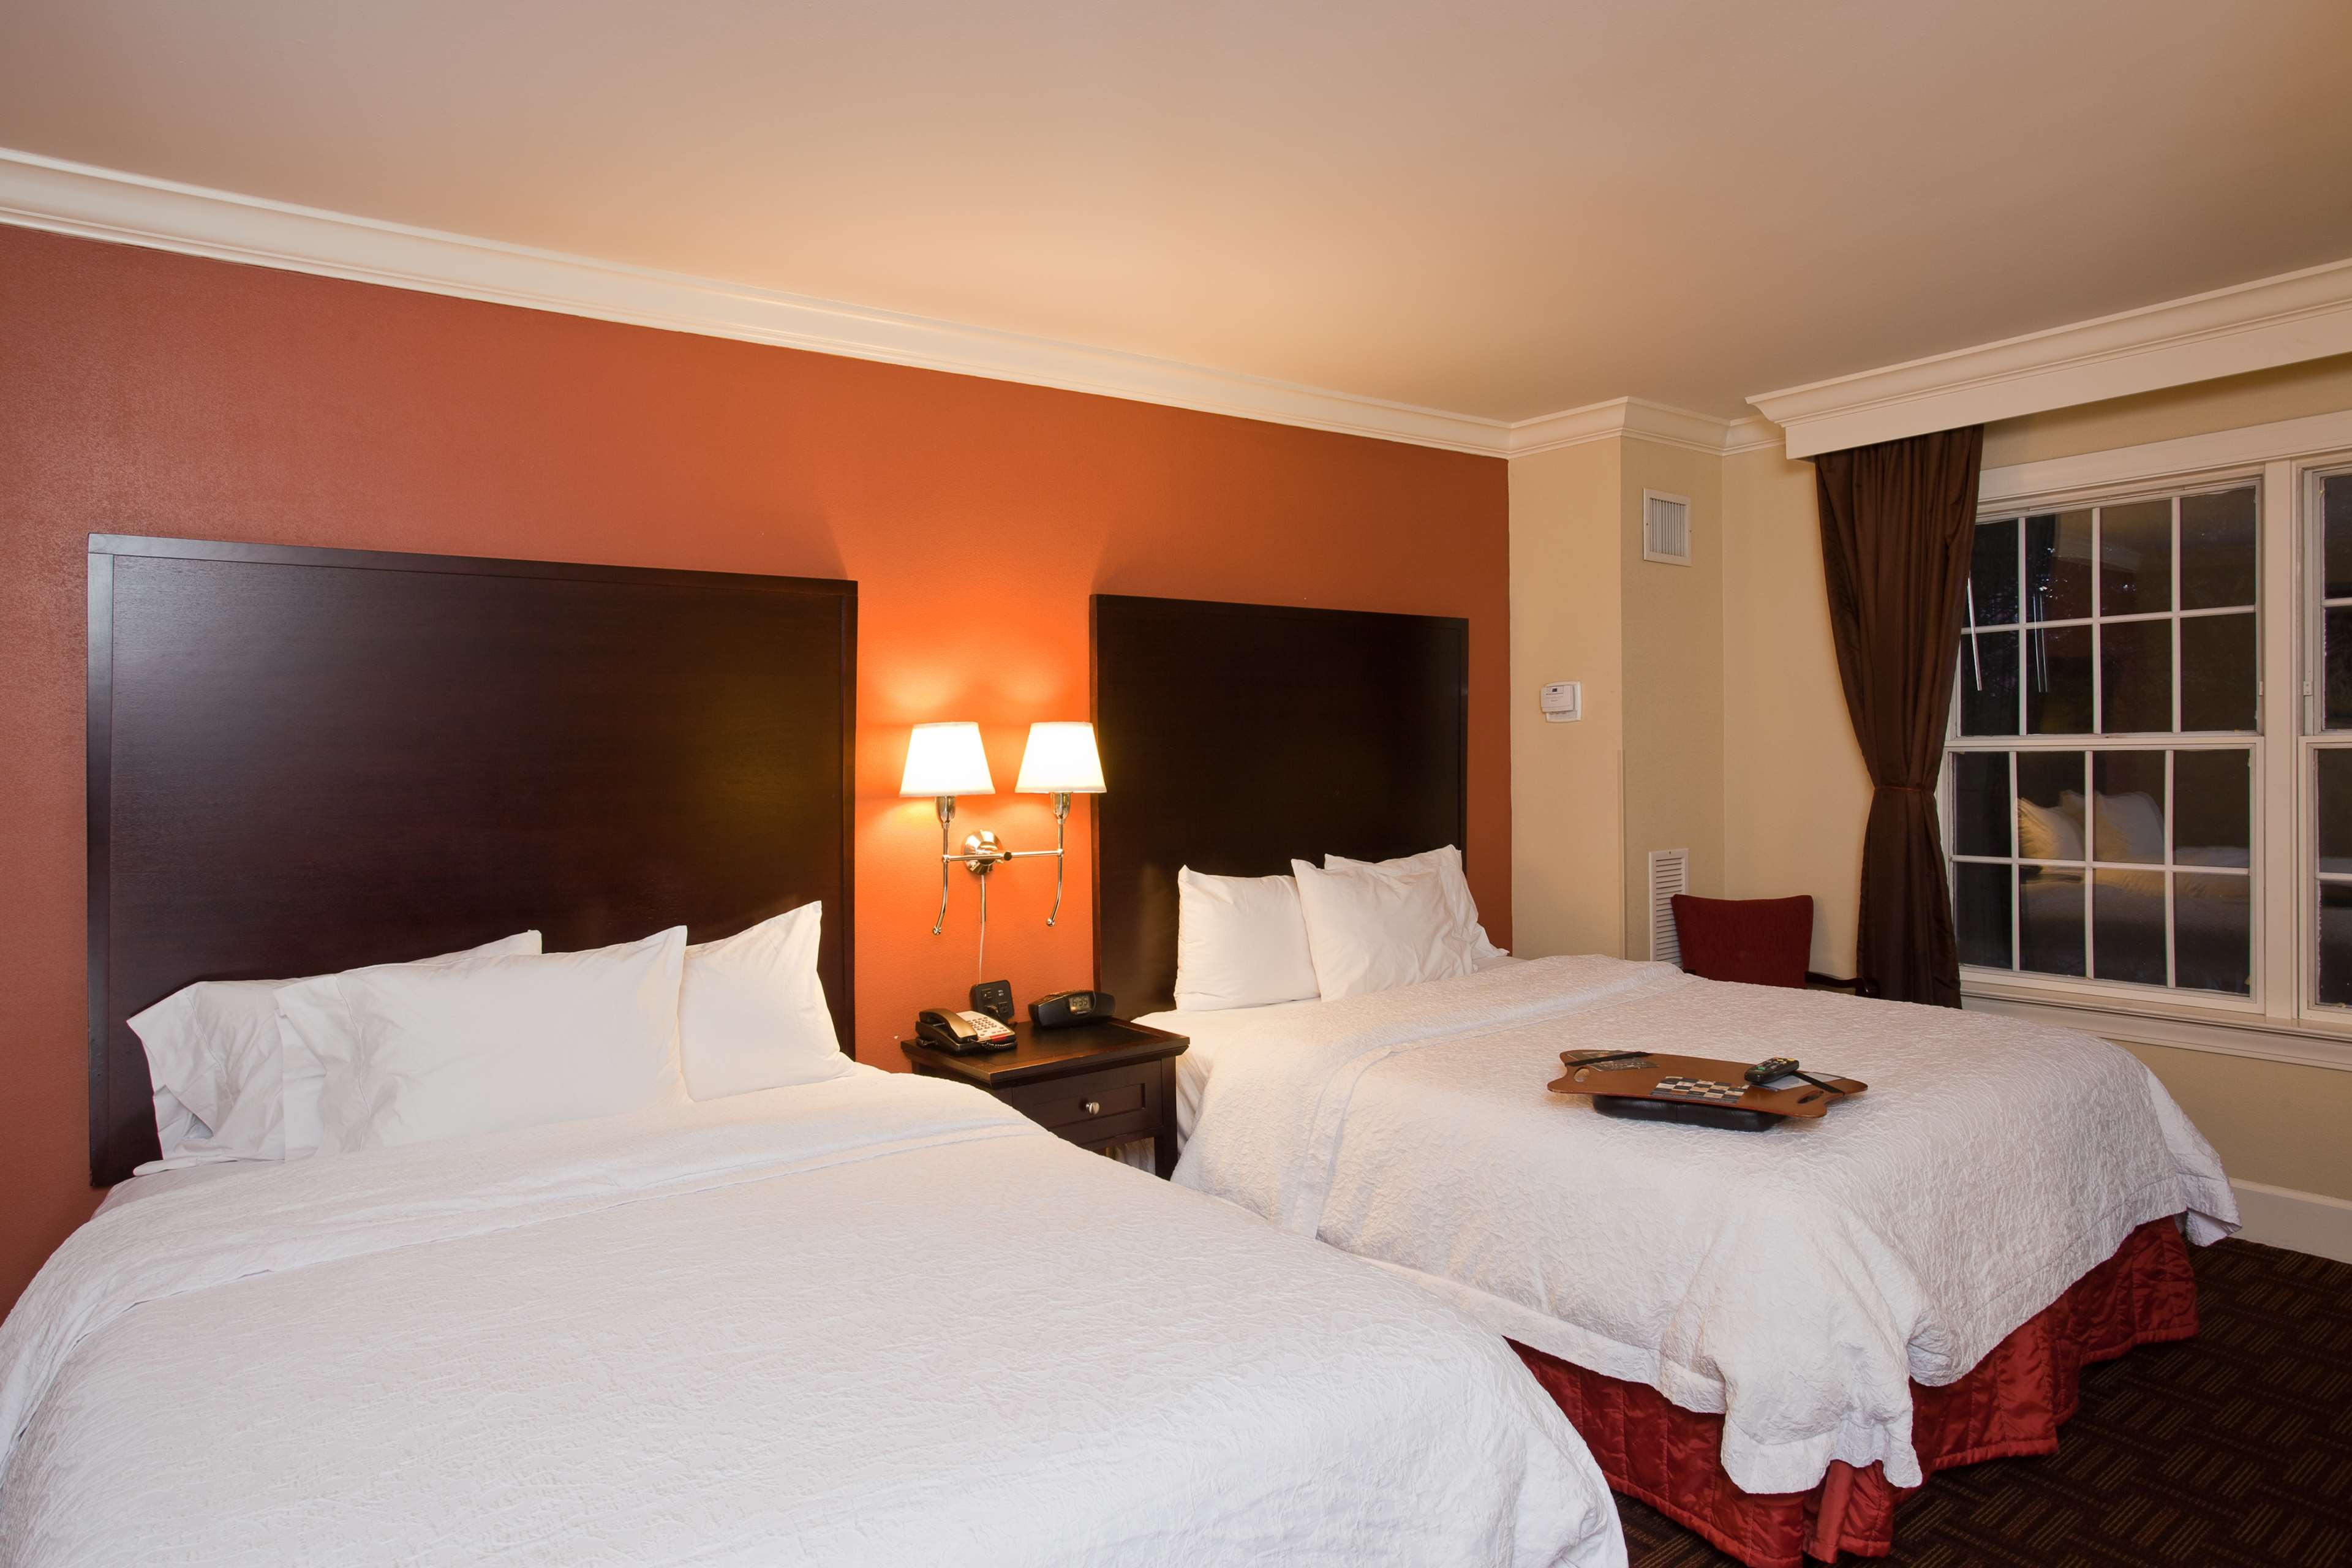 Hampton Inn & Suites Stamford image 35